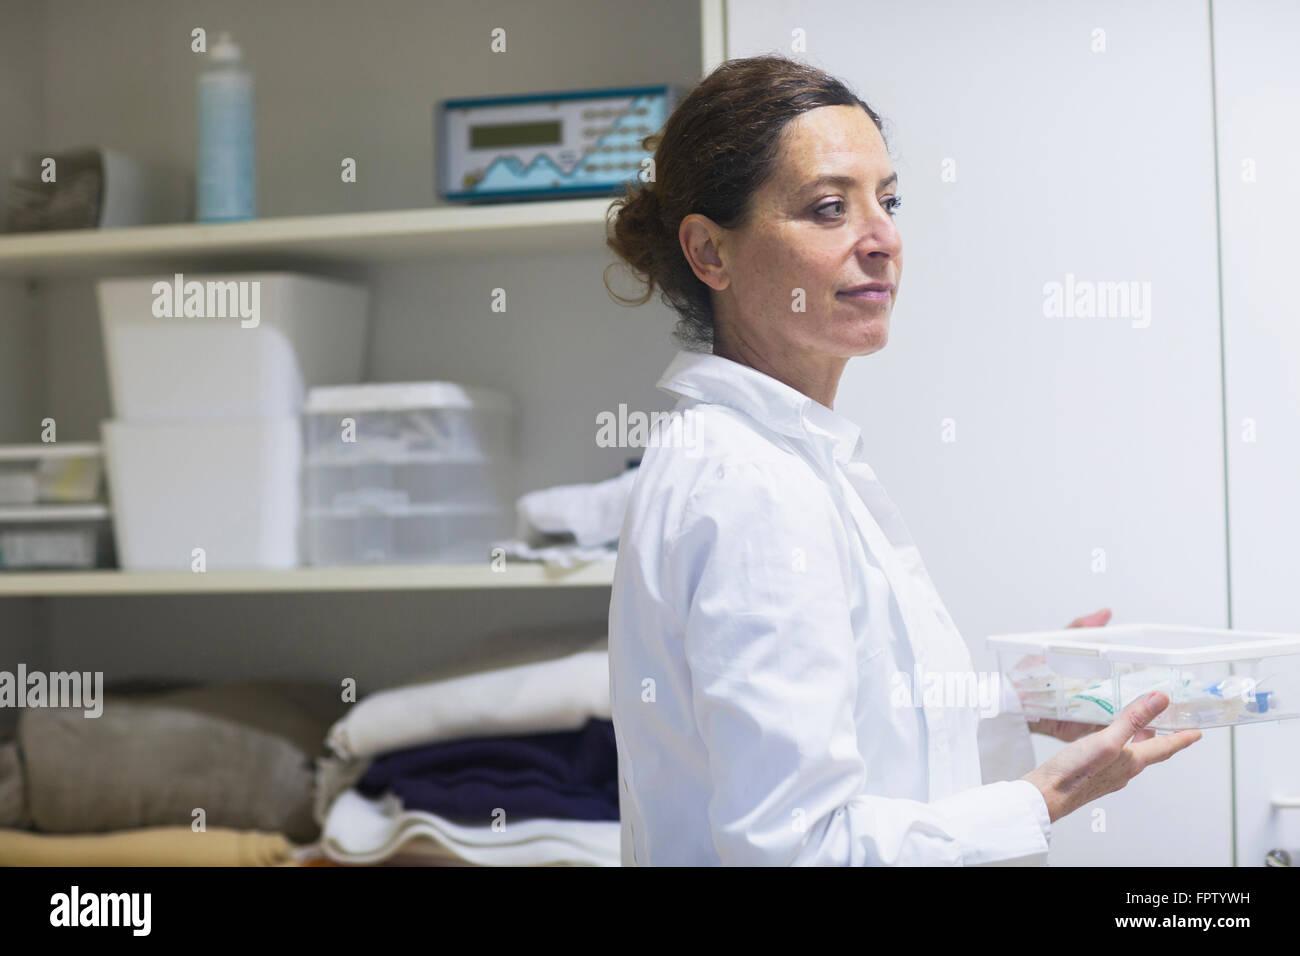 Female doctor holding un médicament fort, Freiburg im Breisgau, Bade-Wurtemberg, Allemagne Banque D'Images